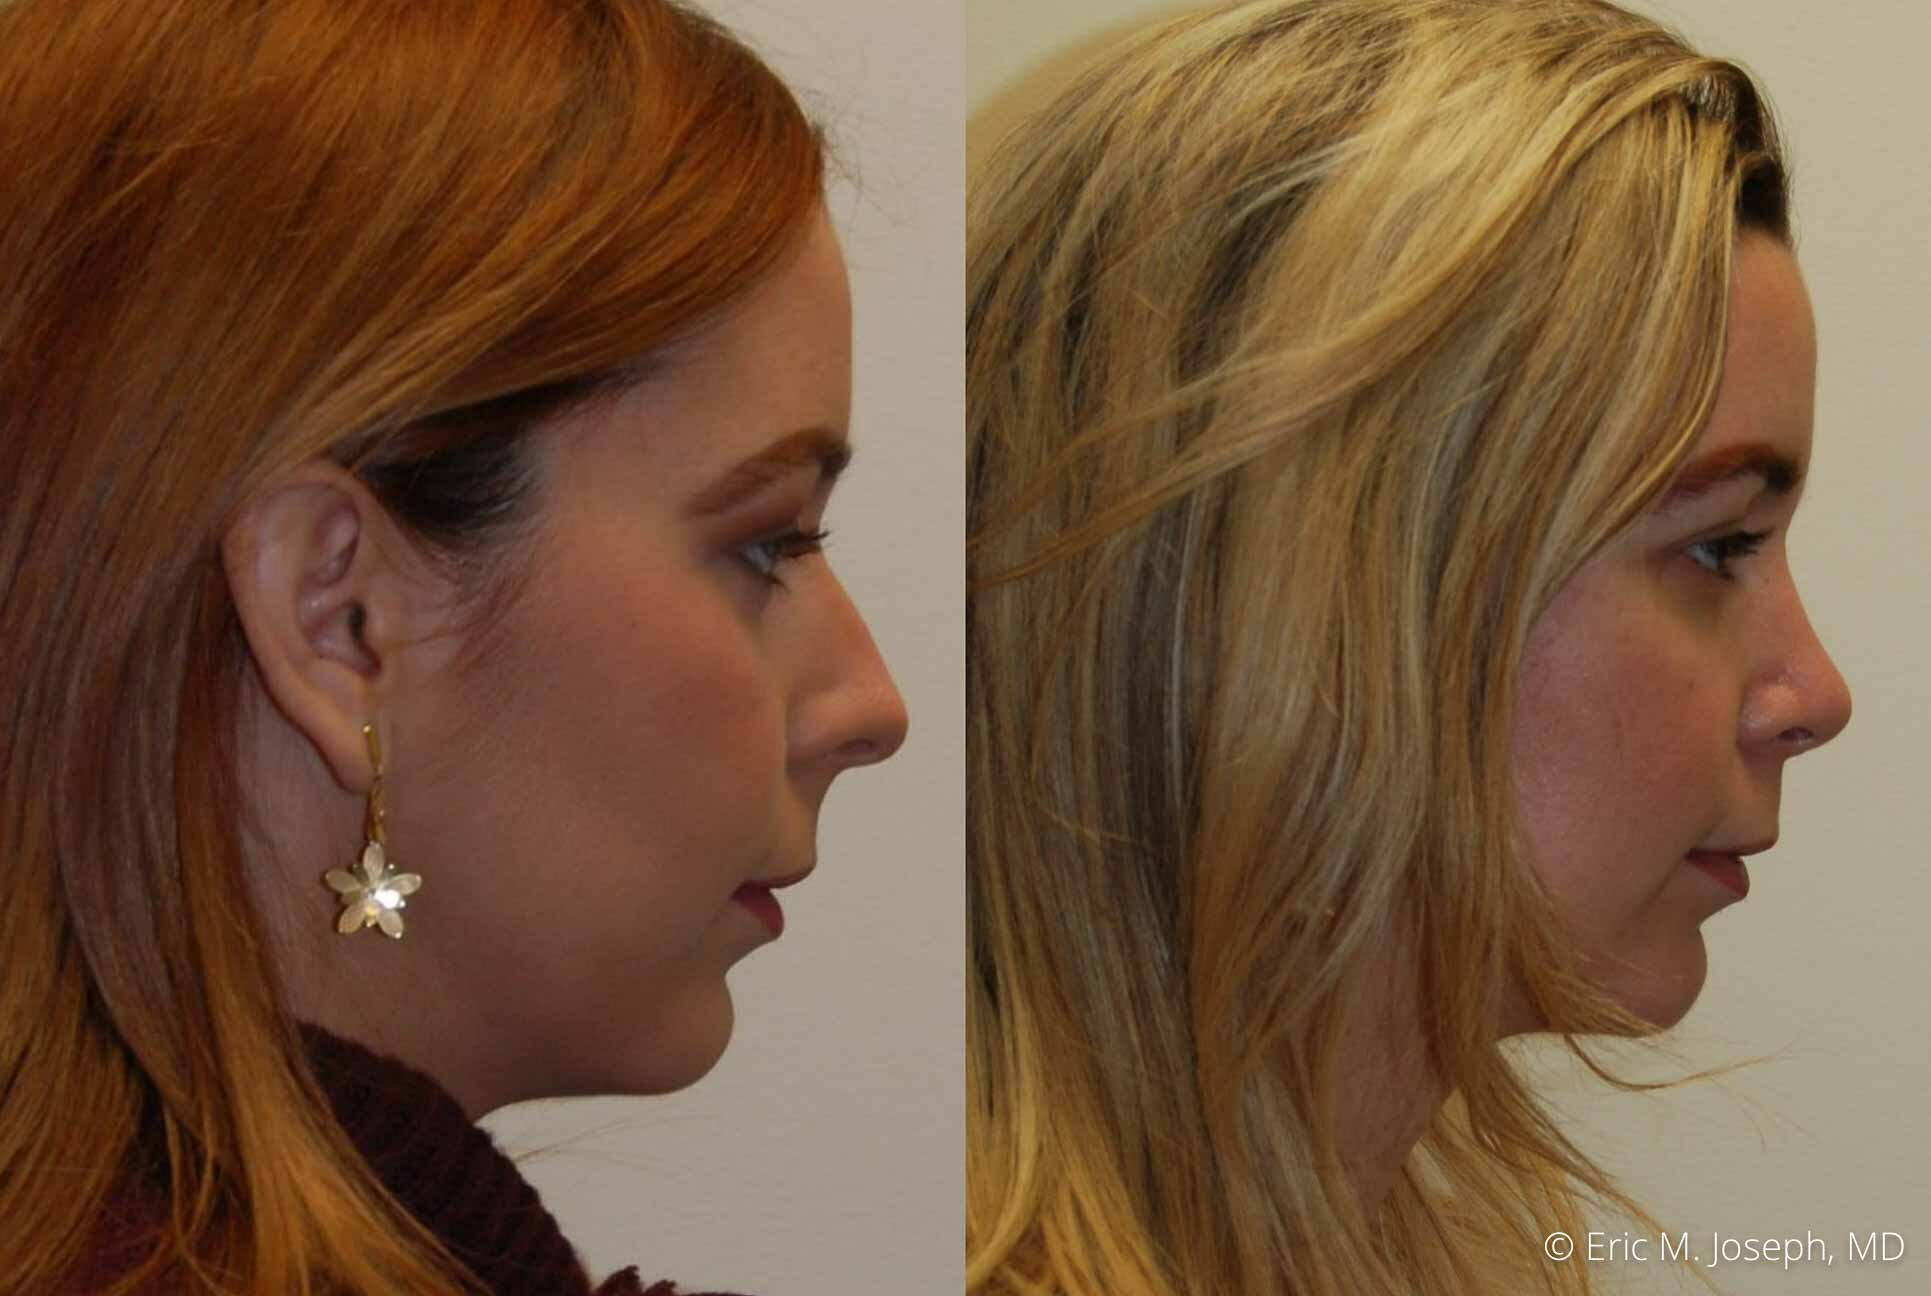 rhinoplasty-nj-nose-job-0545.jpg